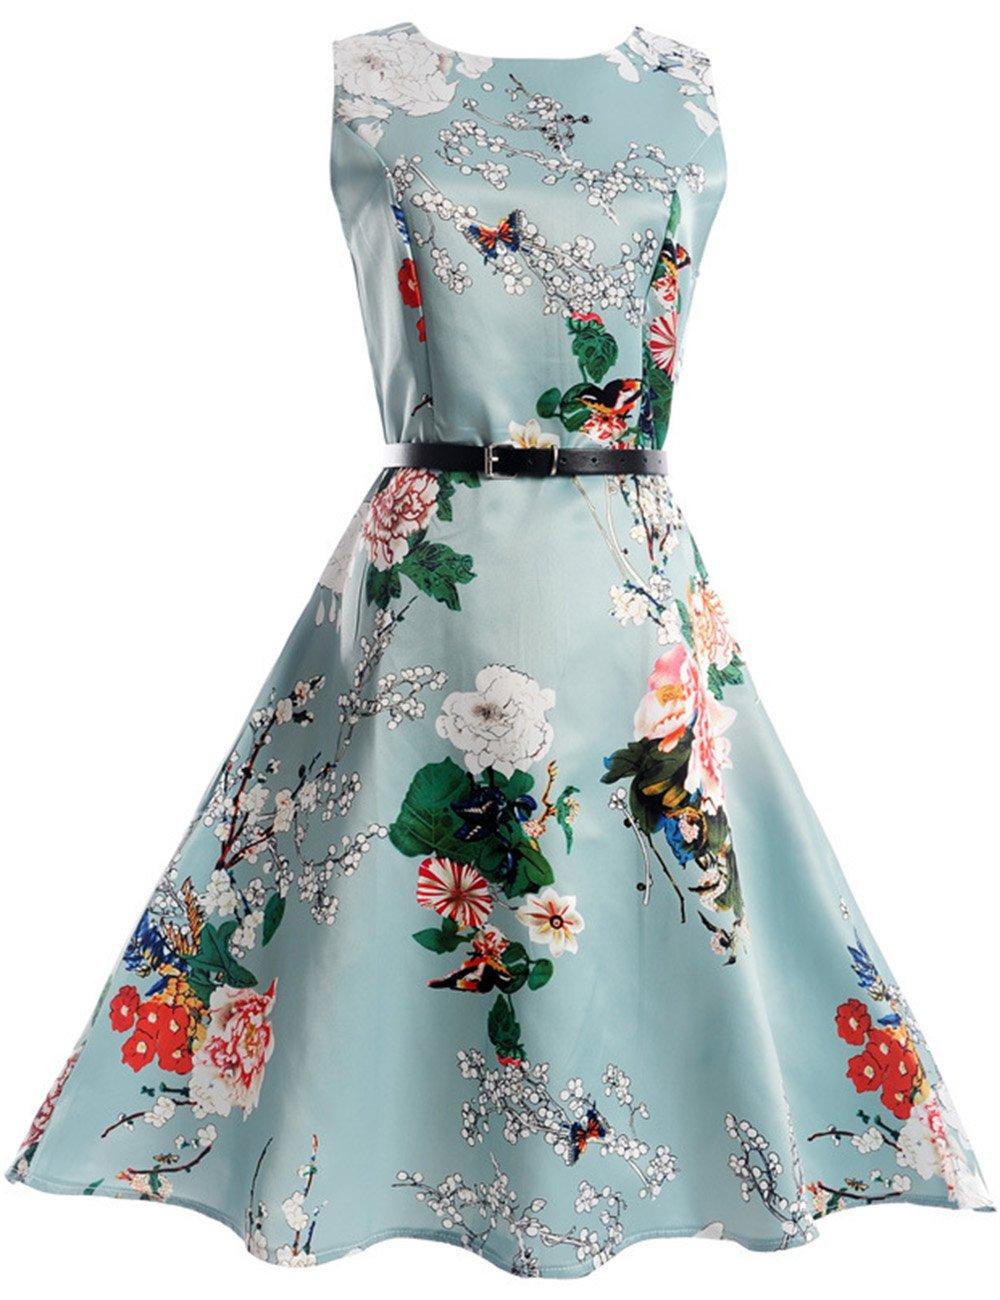 Girls Kids Casual Dress Paint Butterfly Rose Animal Fall Long Sleeve/Sleeveless Dresses 42159-F00A